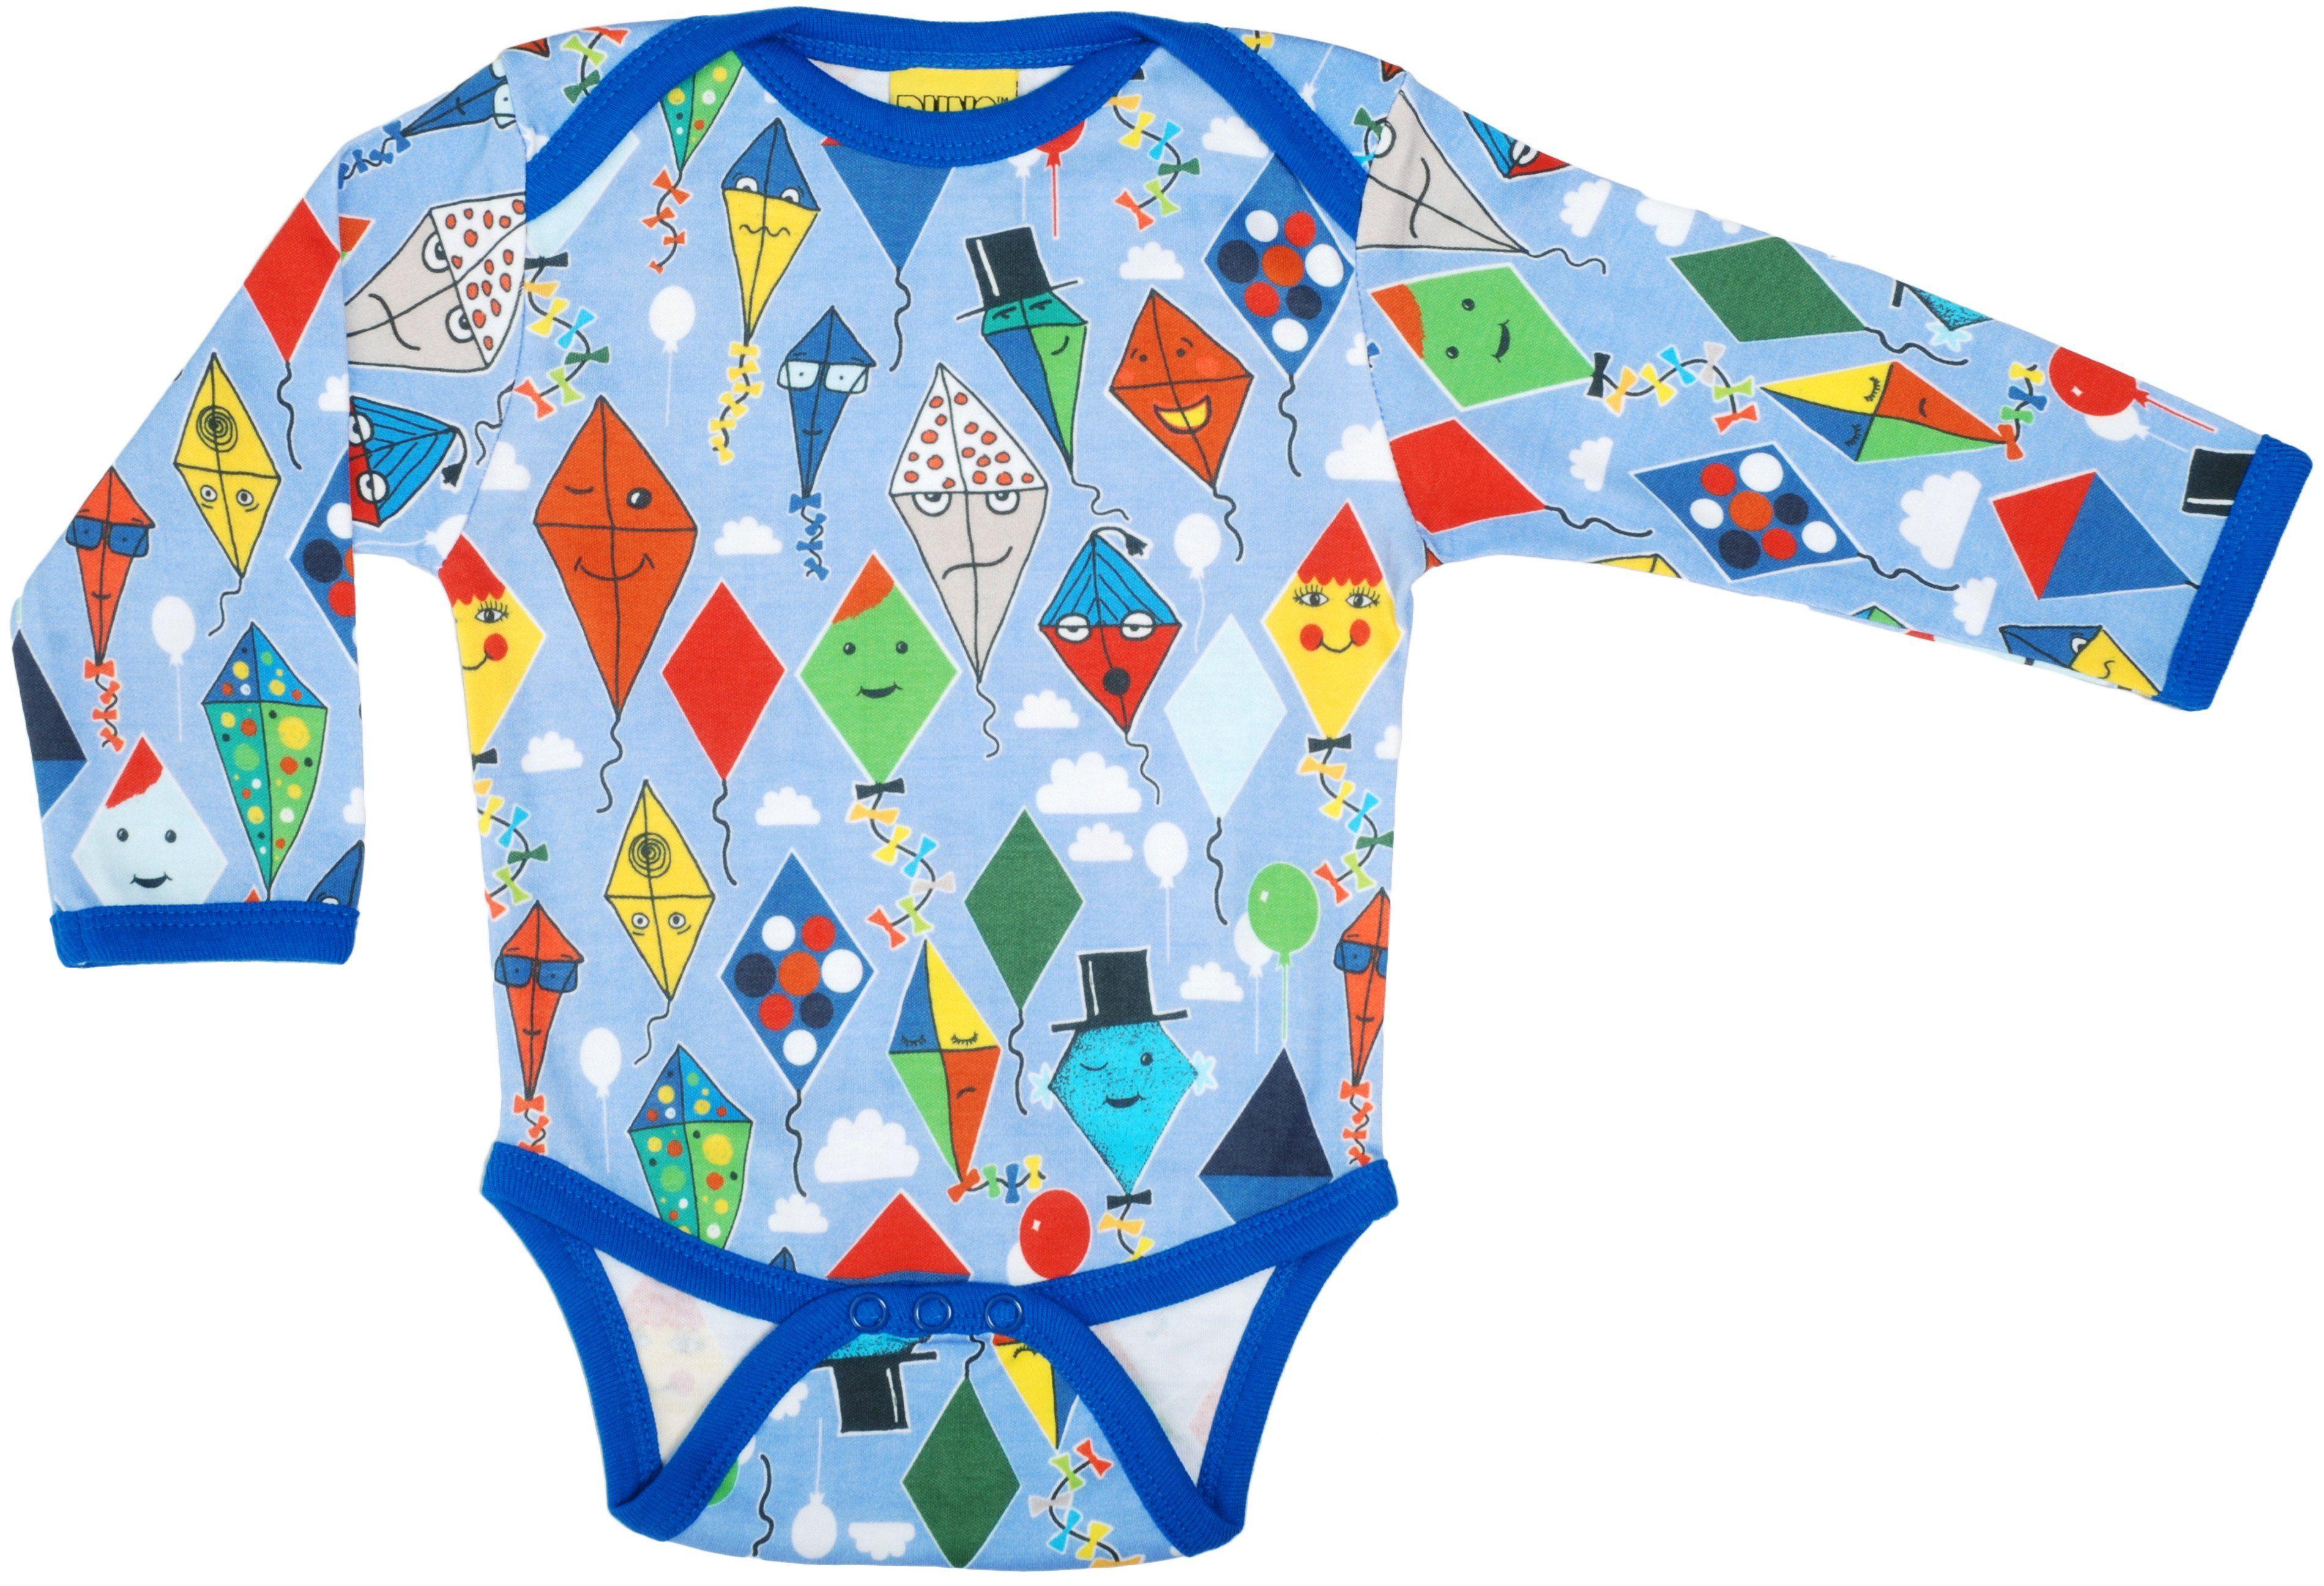 Kite Organic cotton baby hats newborn to 6 months BRAND NEW BABY GIFT IDEA